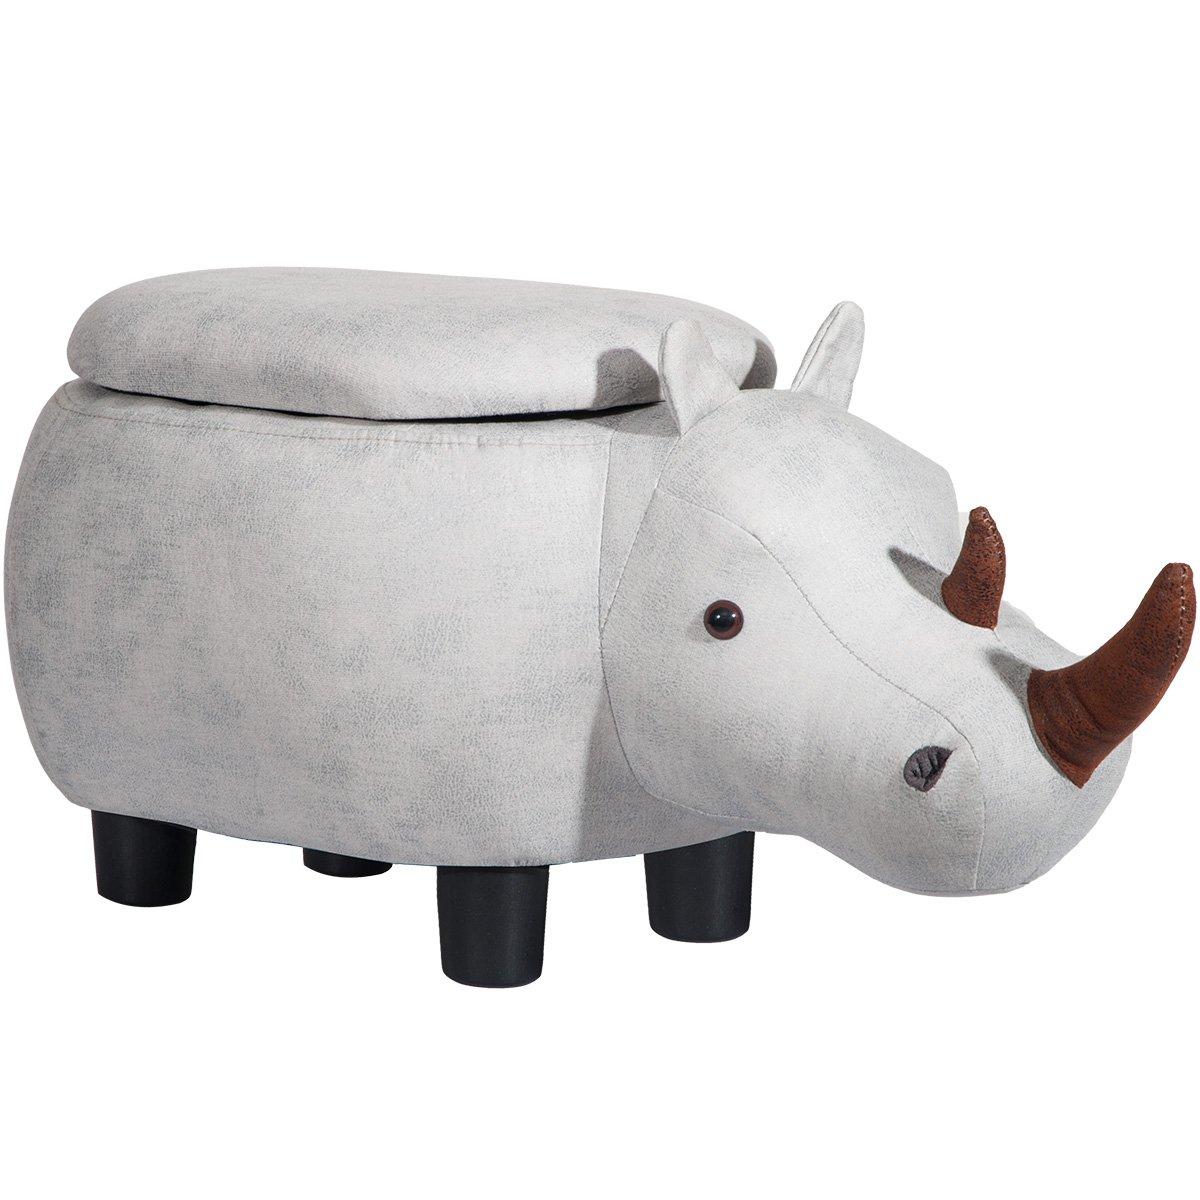 Merax Fun Fair Ride-on Storage Ottoman Footrest Stool with Animal Shape, Gray Rhinoceros